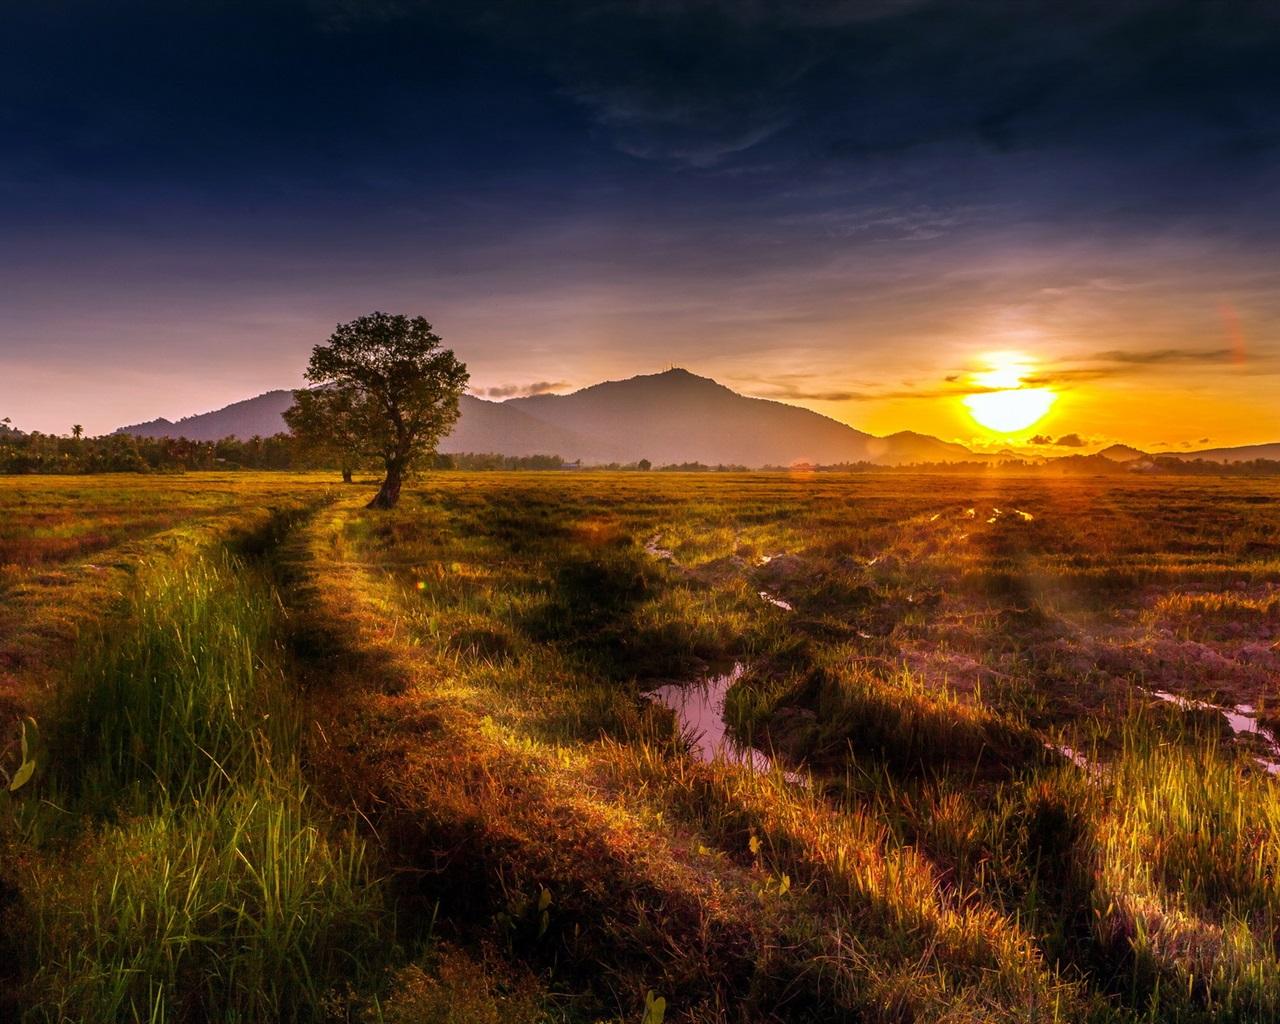 summer sunset landscape wallpaper - photo #11